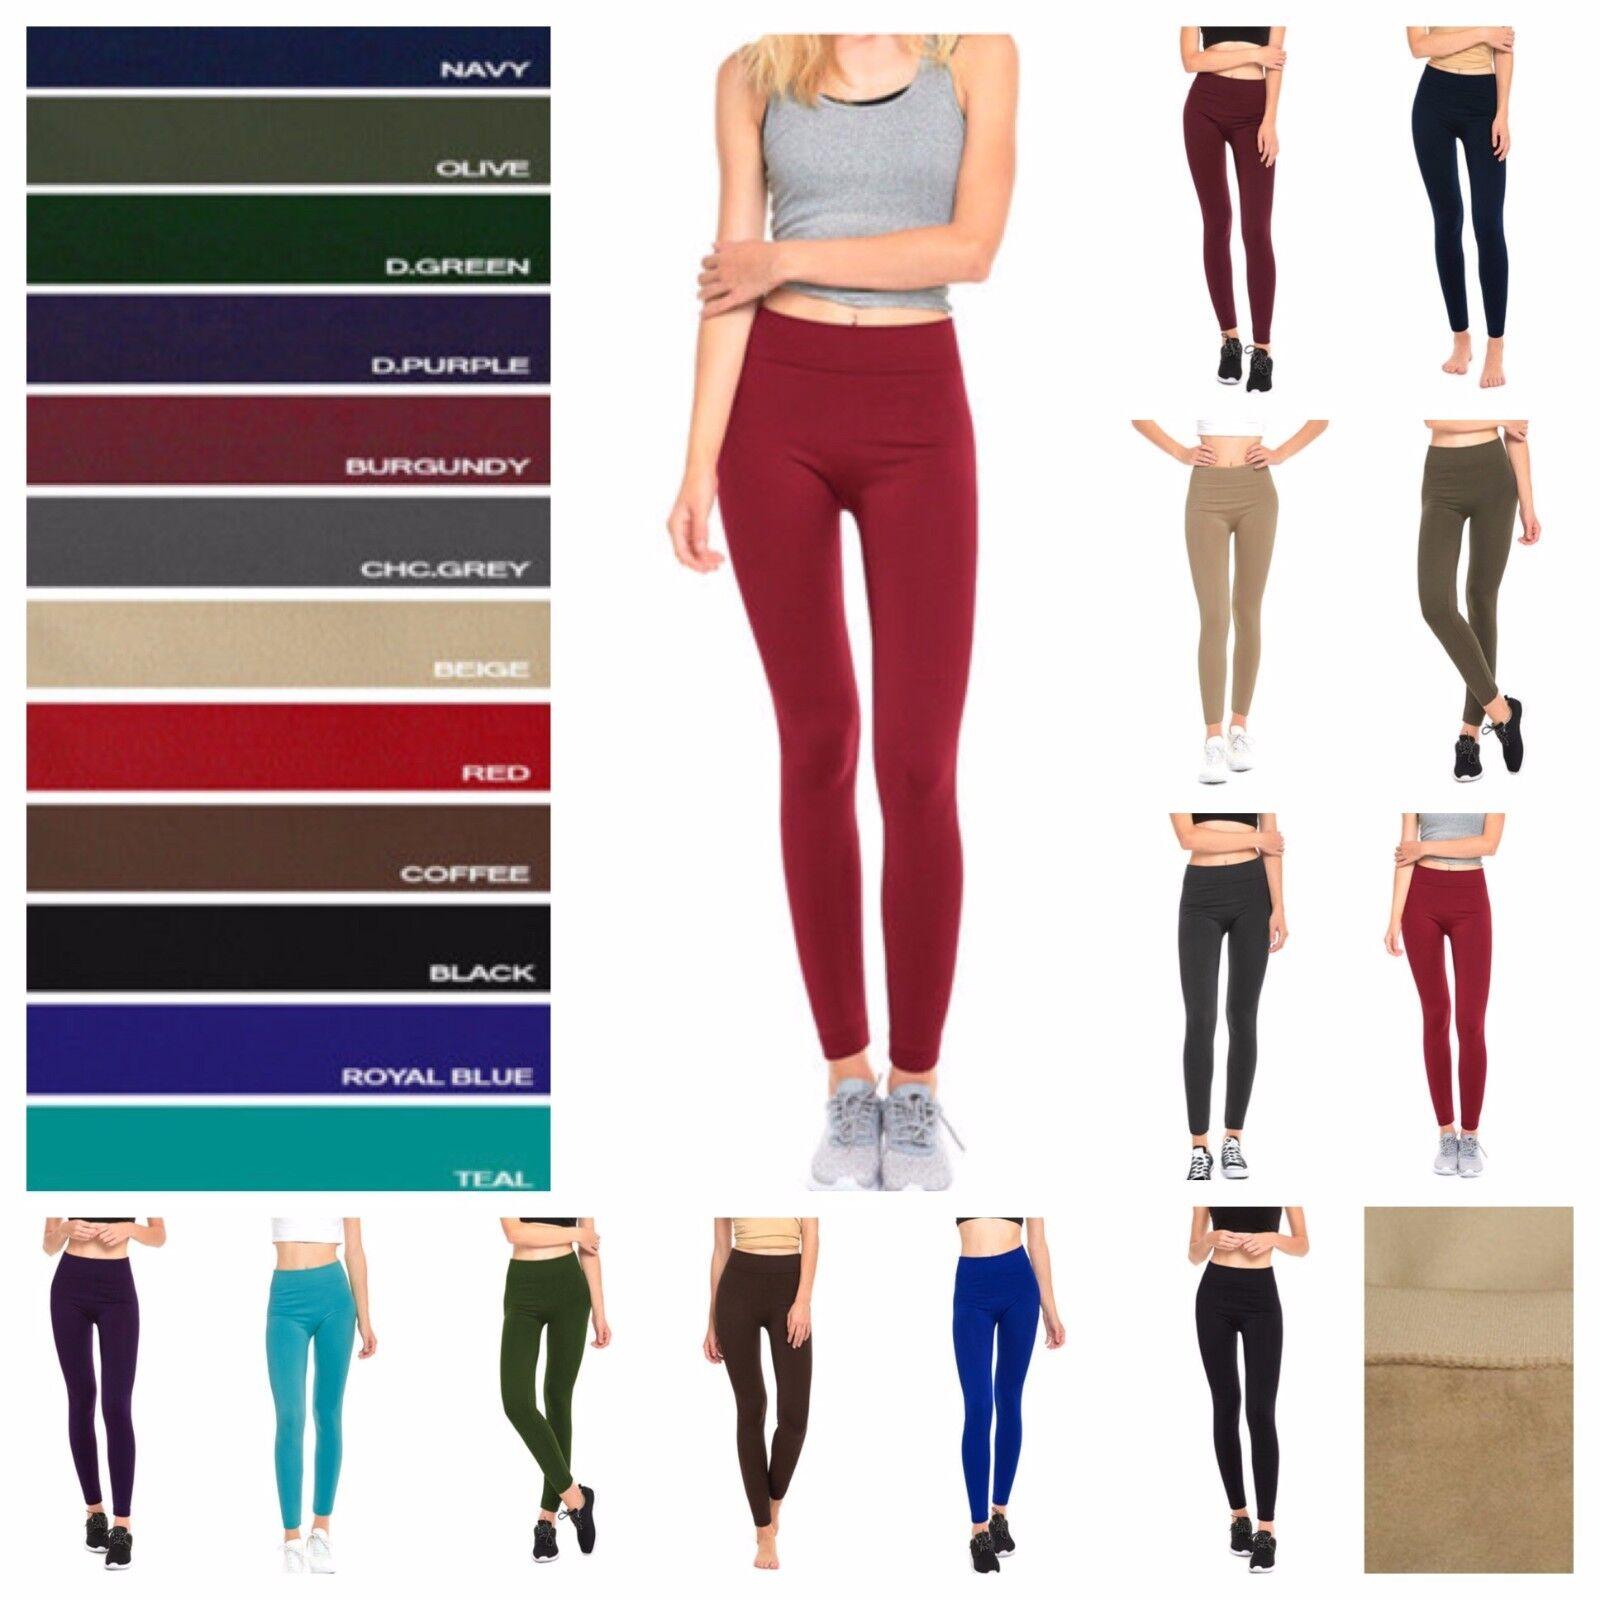 Women Fleece Leggings Fashion Casual Seamless Winter Warm Thermal  Tight Pants